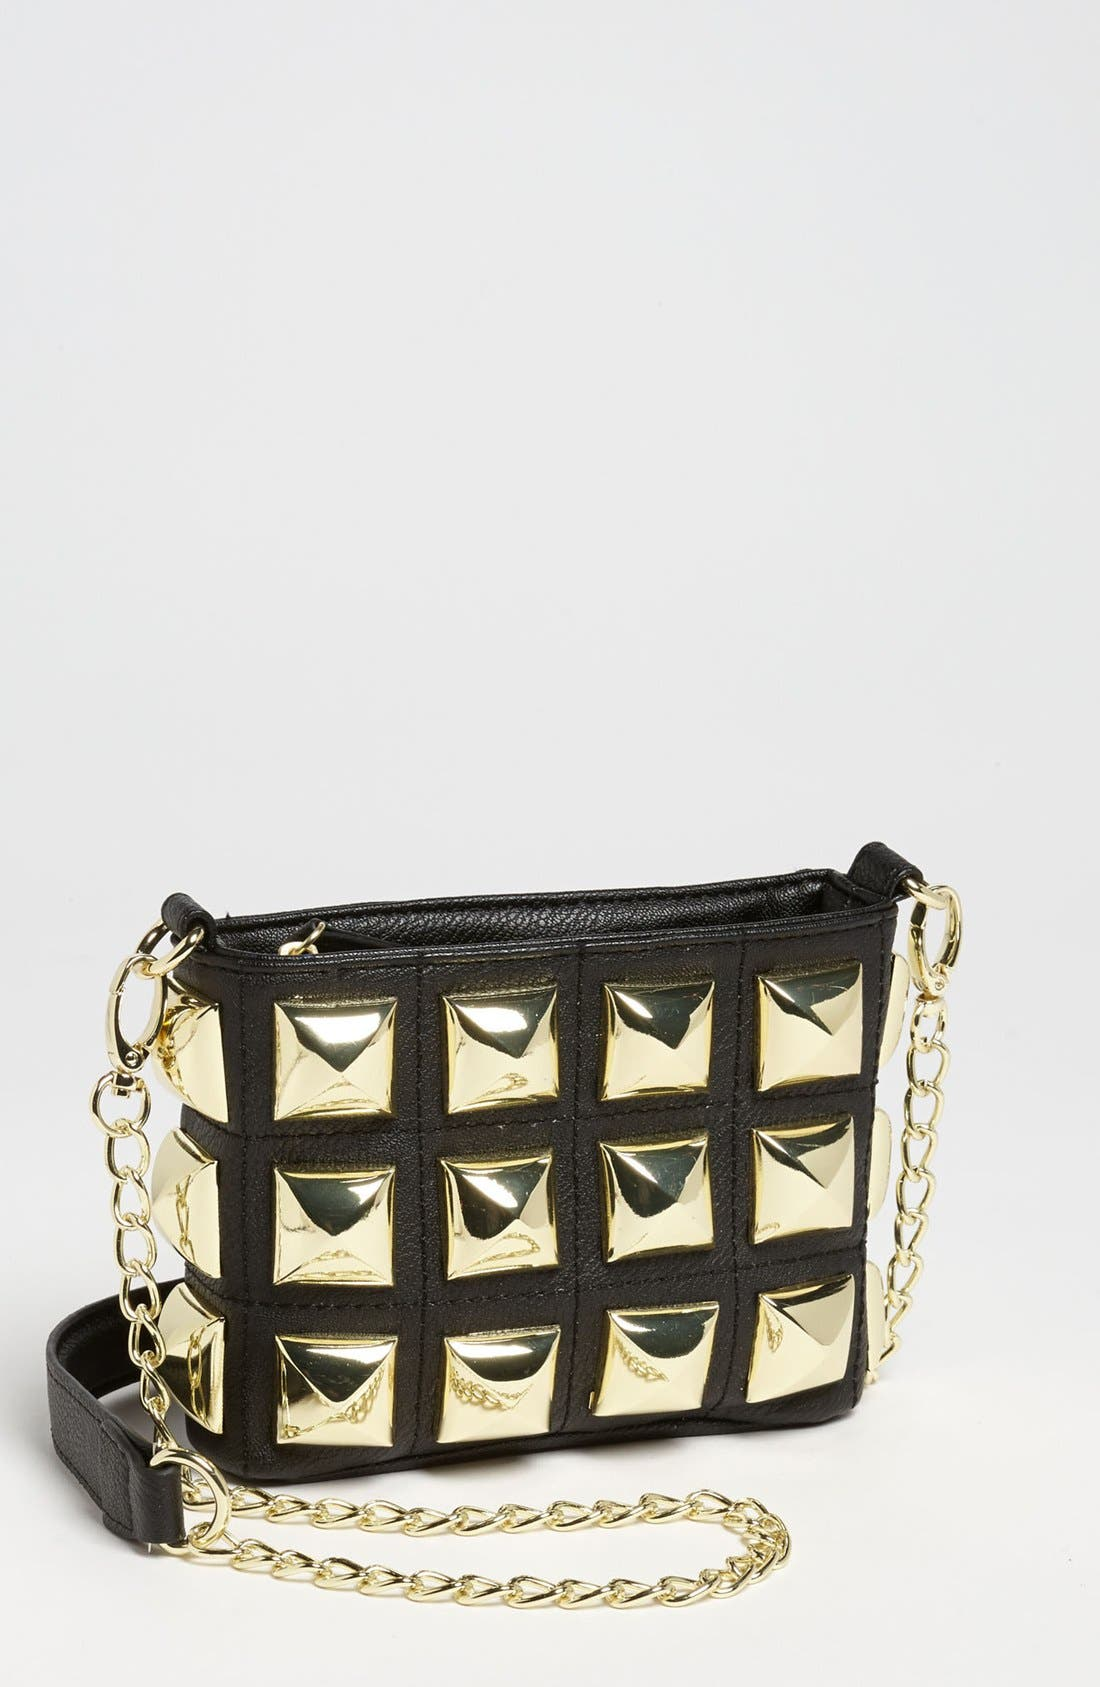 Main Image - Betsey Johnson 'Stud Muffin' Crossbody Bag